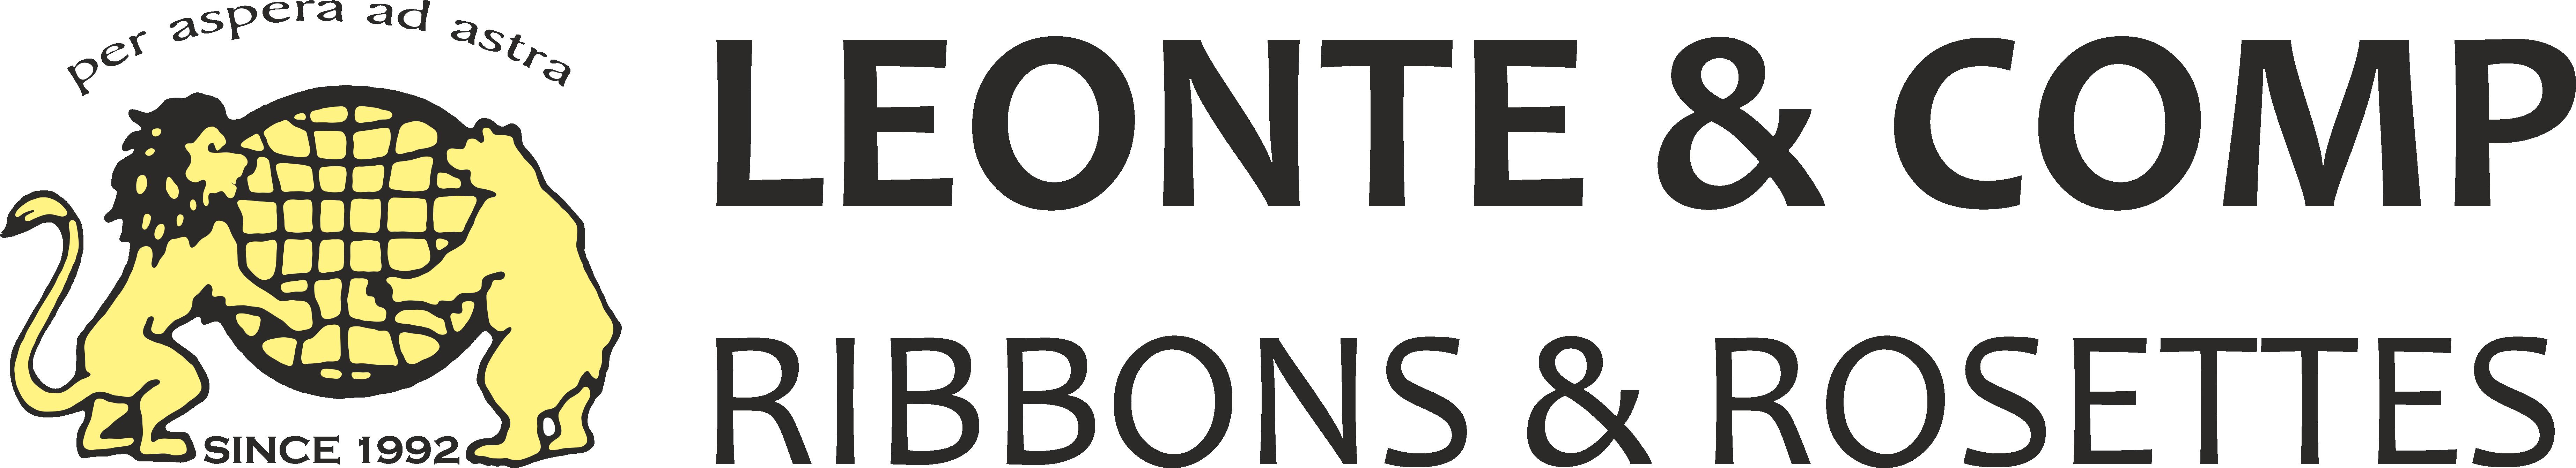 logo-leonte-export-ribbons-rosettes